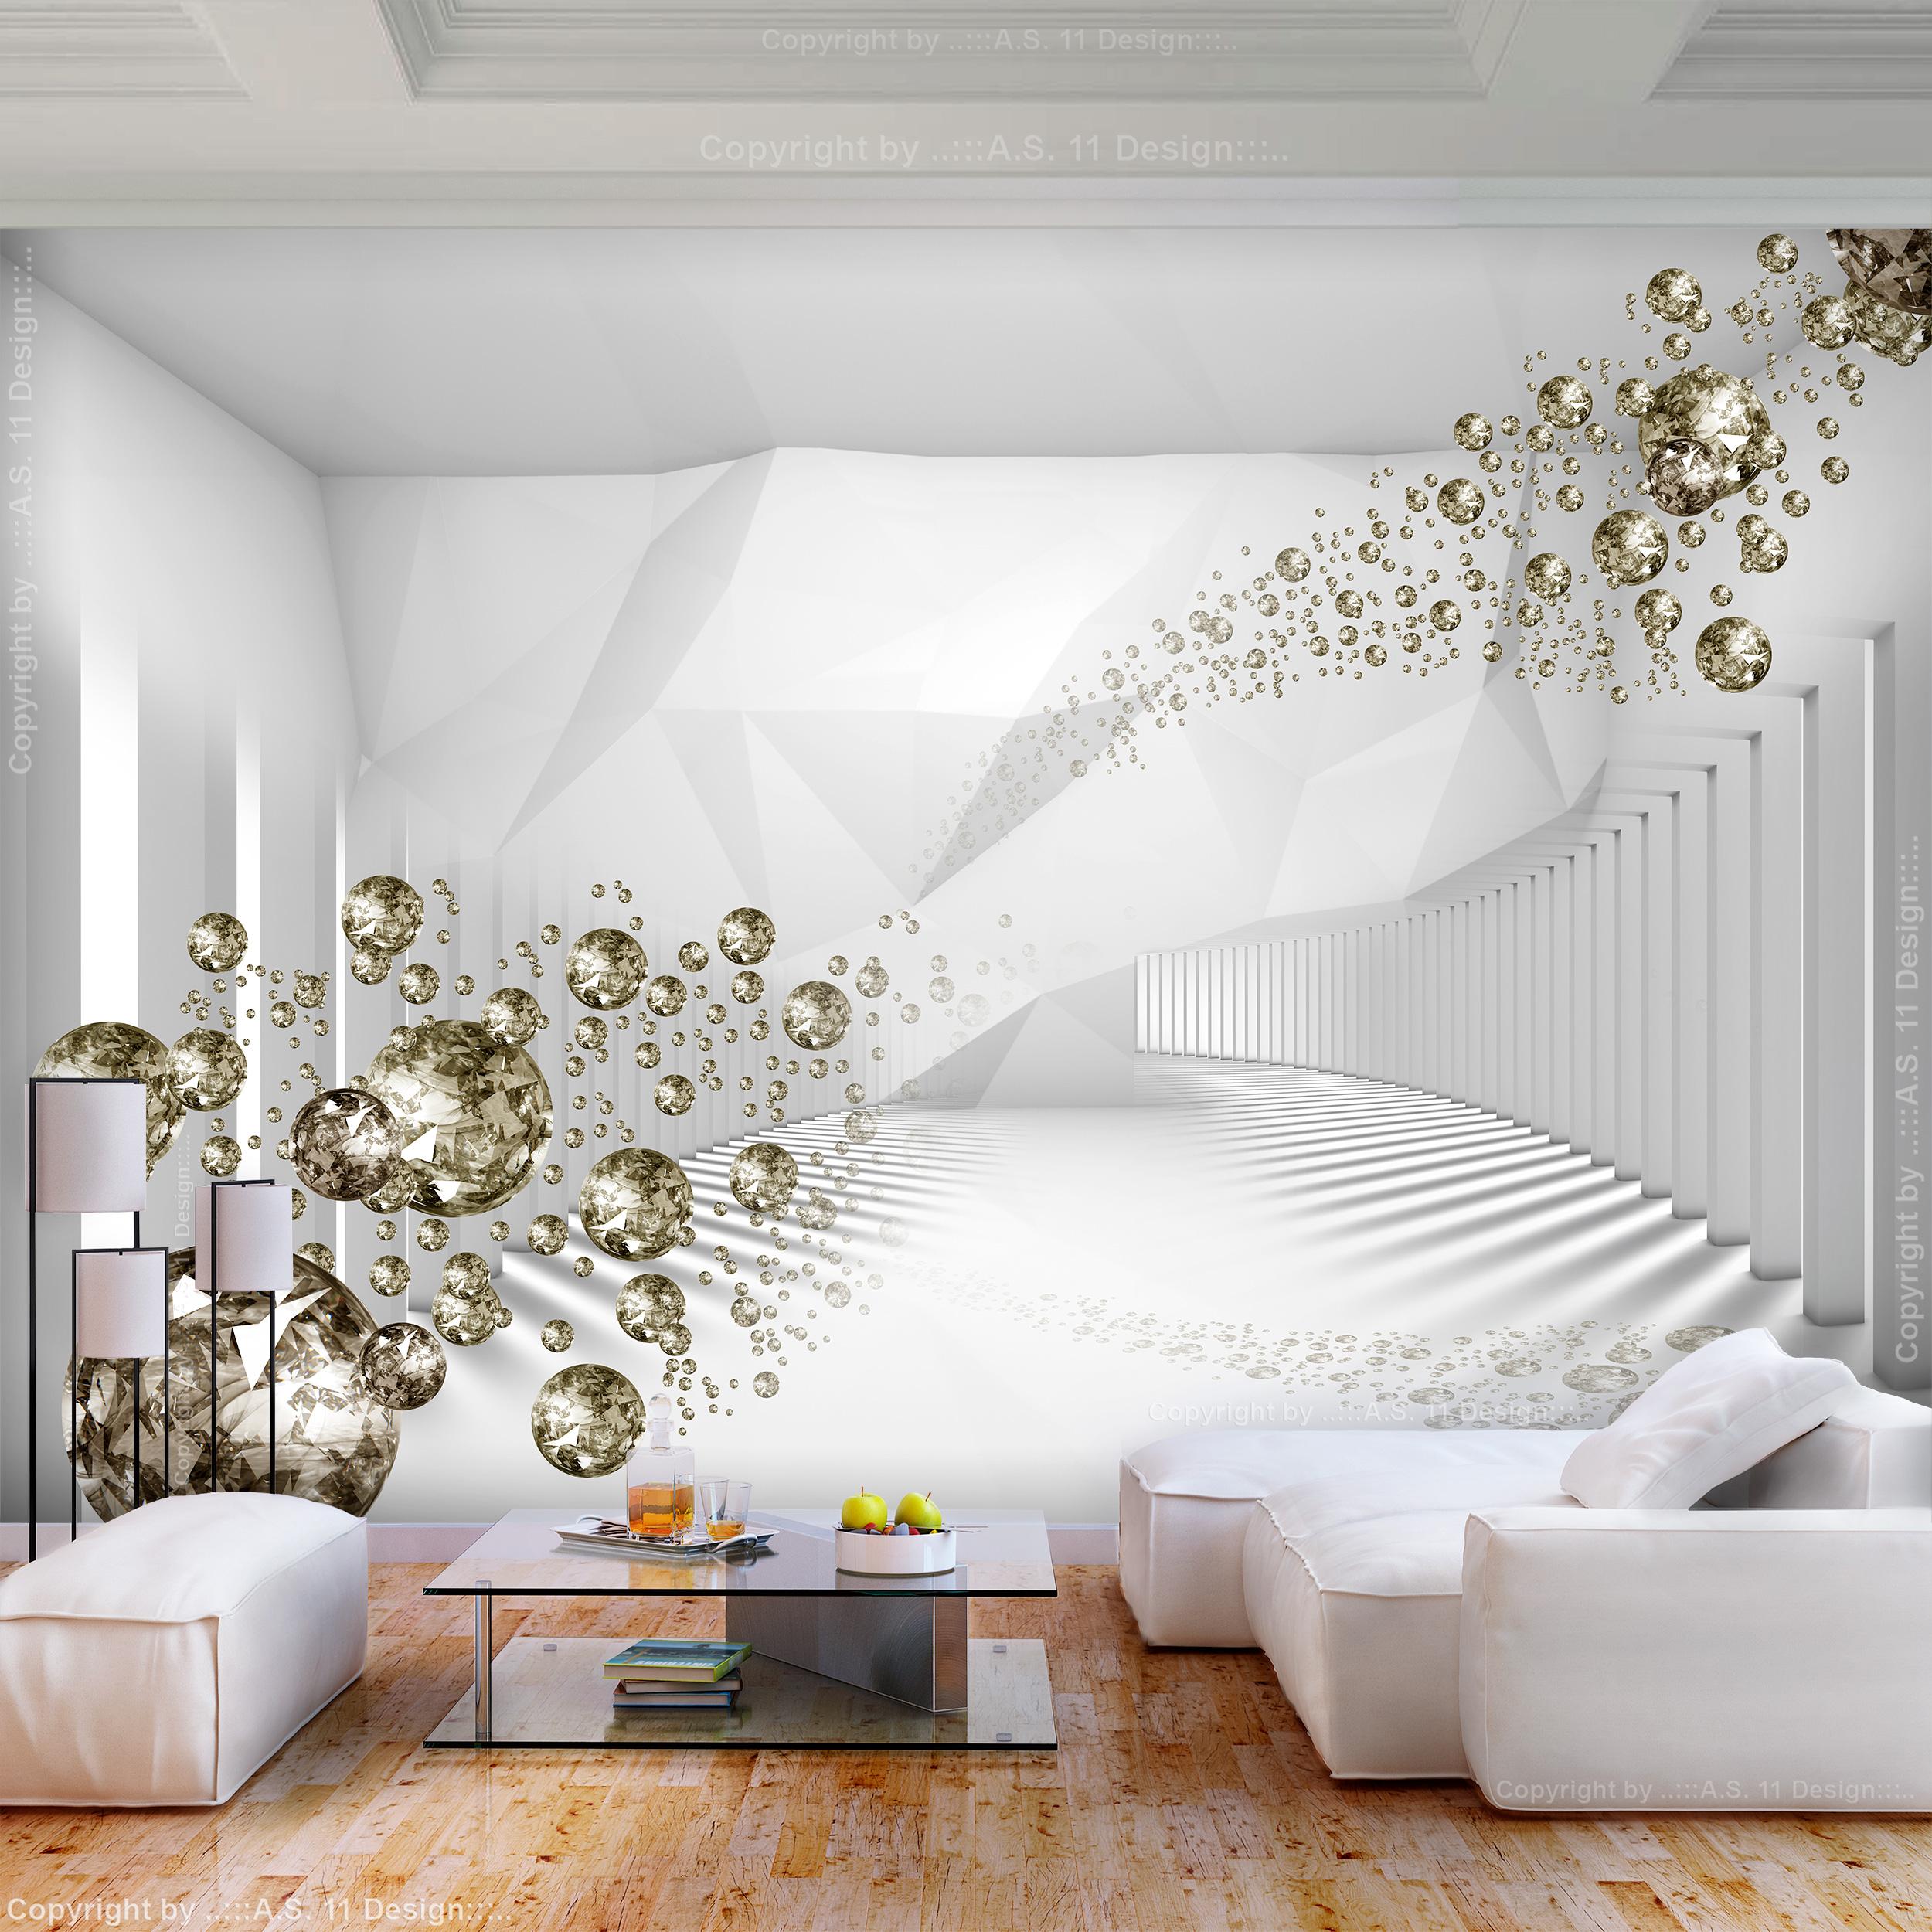 vlies fototapete 3d optik tunnel wei diamant tapete. Black Bedroom Furniture Sets. Home Design Ideas